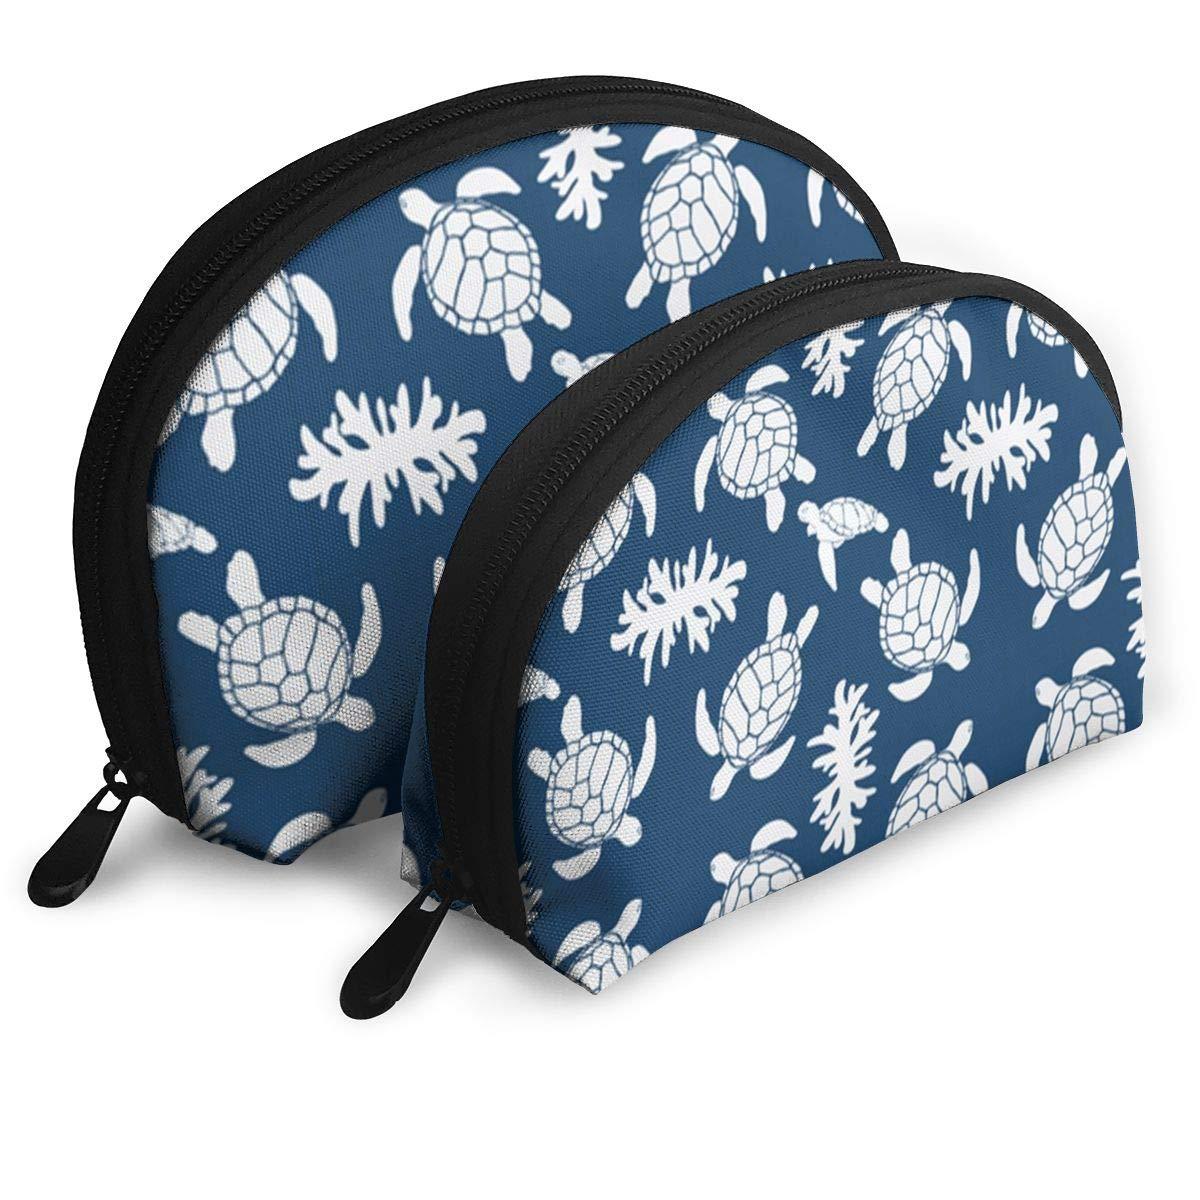 Half Moon Cosmetic Beauty Bag,Cute Turtle Handy Cosmetic Pouch Clutch Makeup Bag For Women Girls